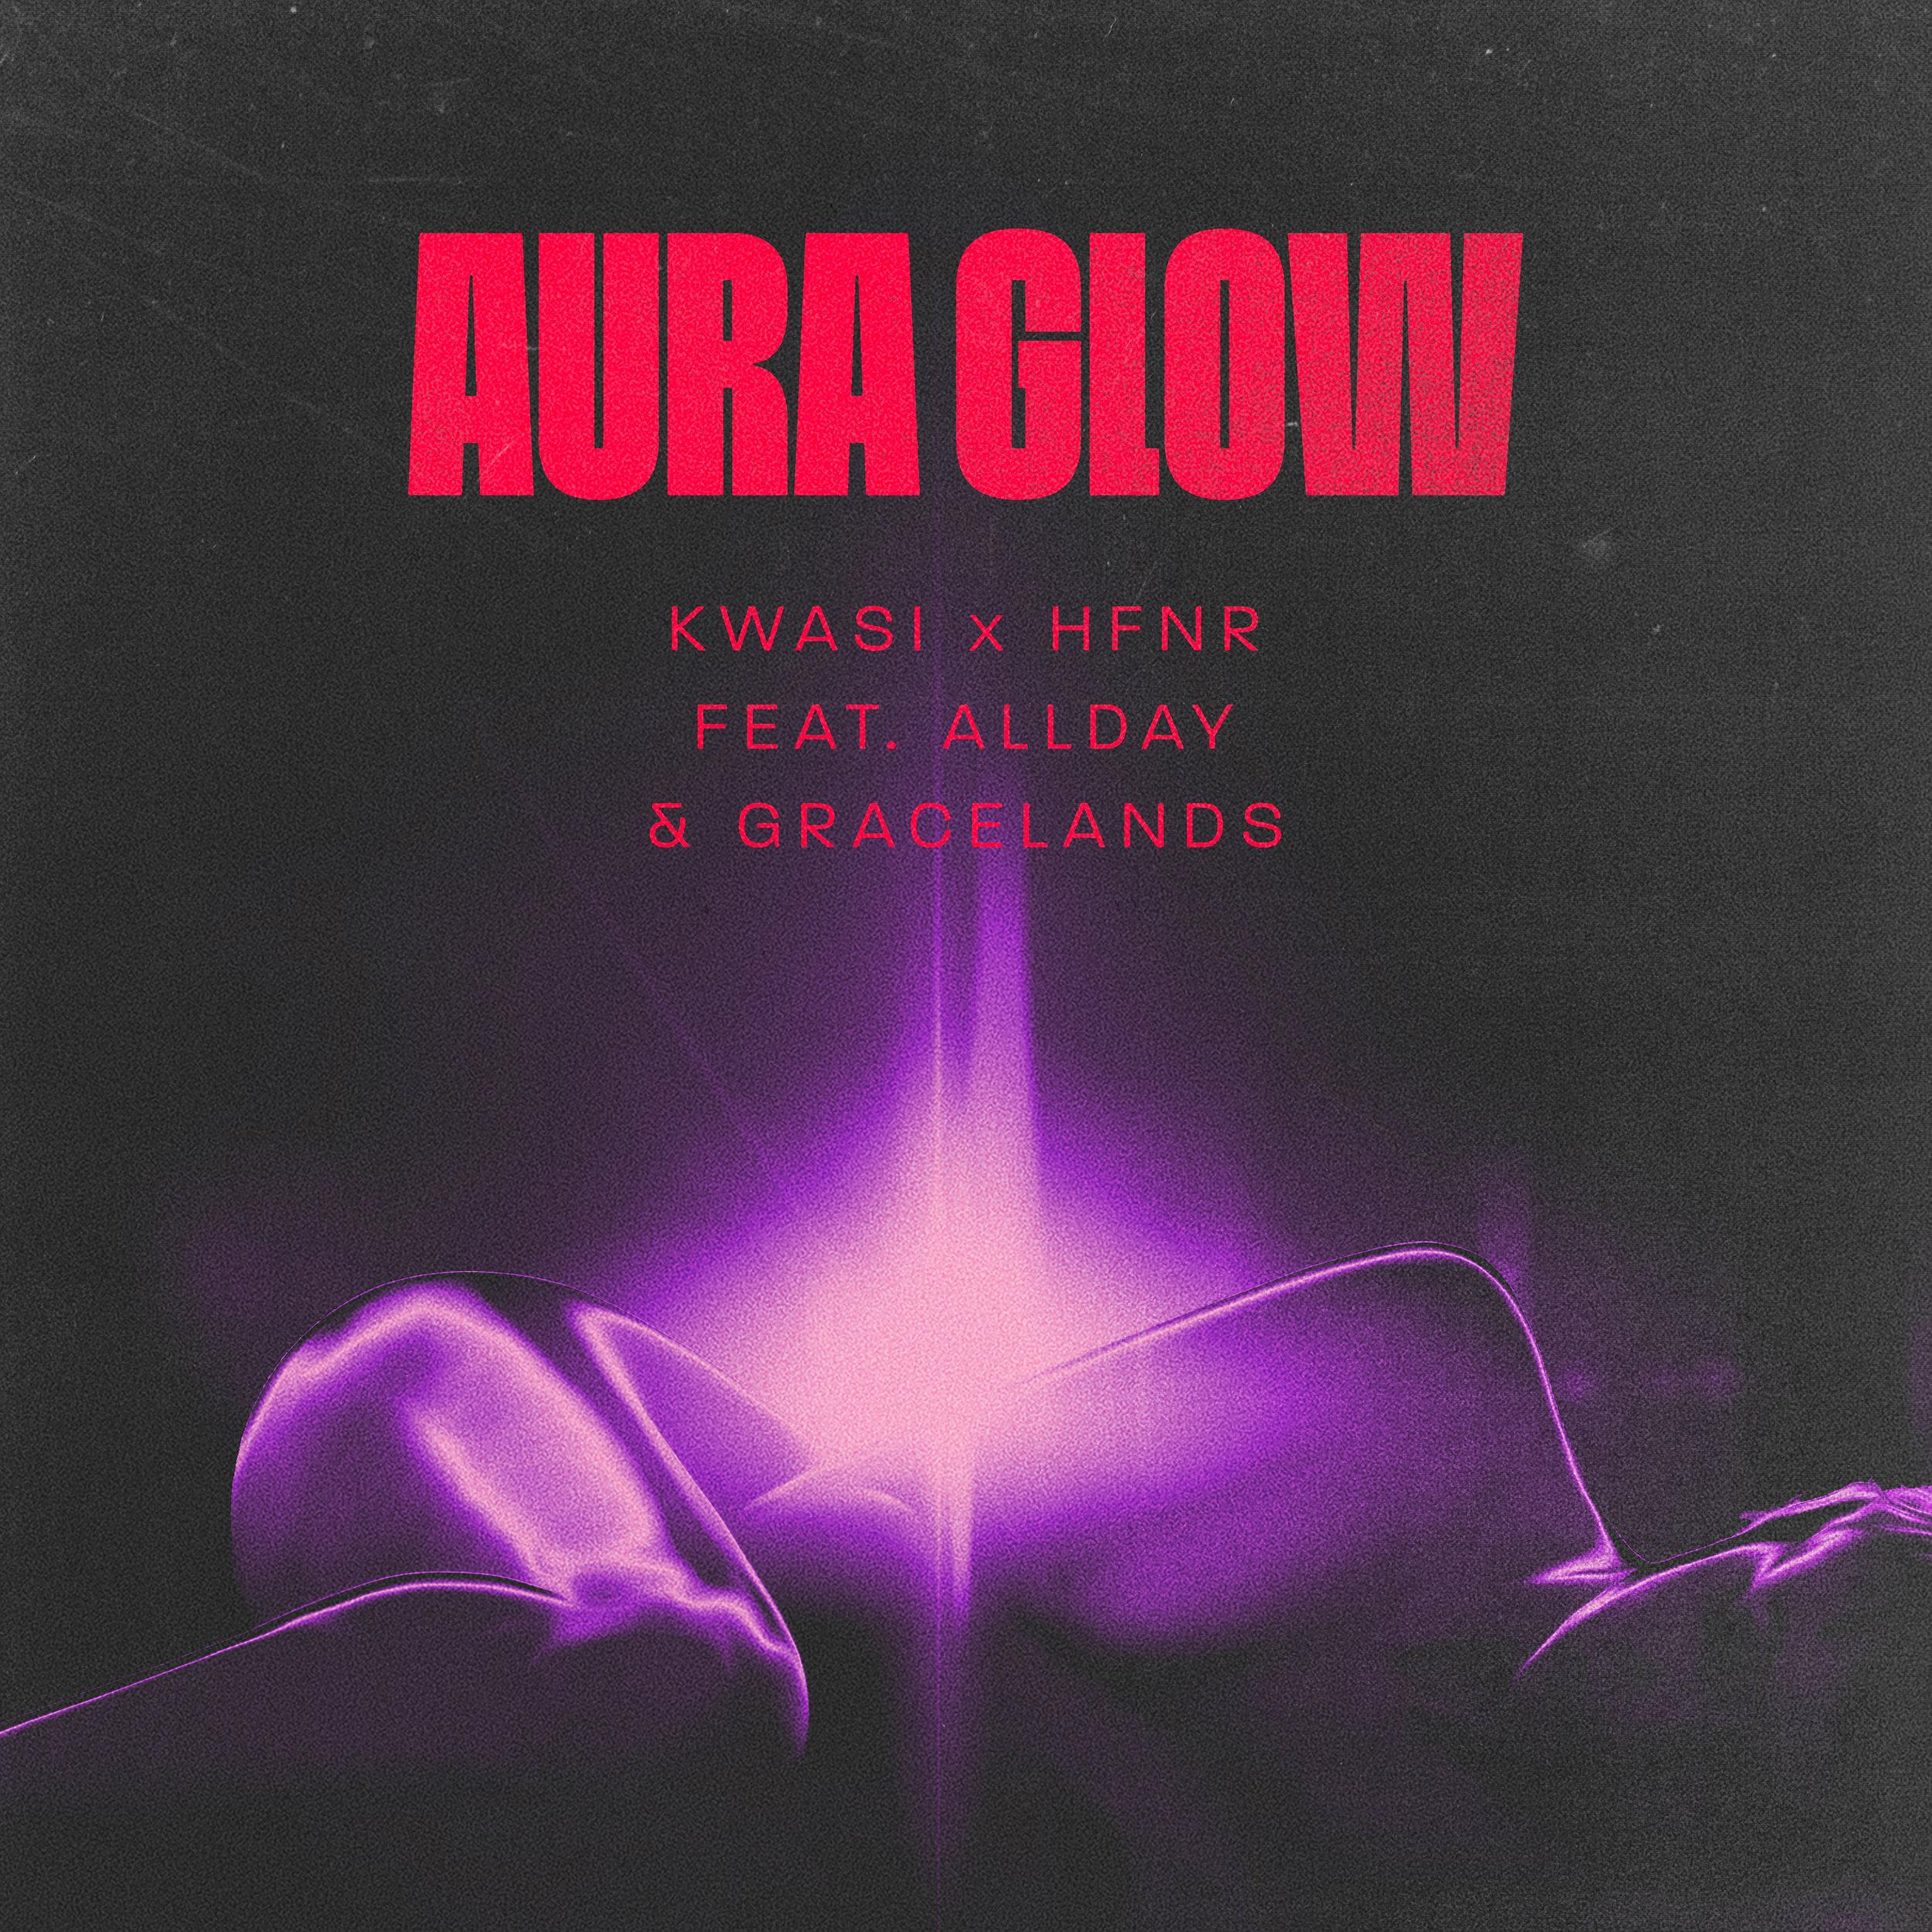 WVS039 - Kwasi x HFNR - Aura Glow featuring Allday & Gracelands - Artworks.jpg